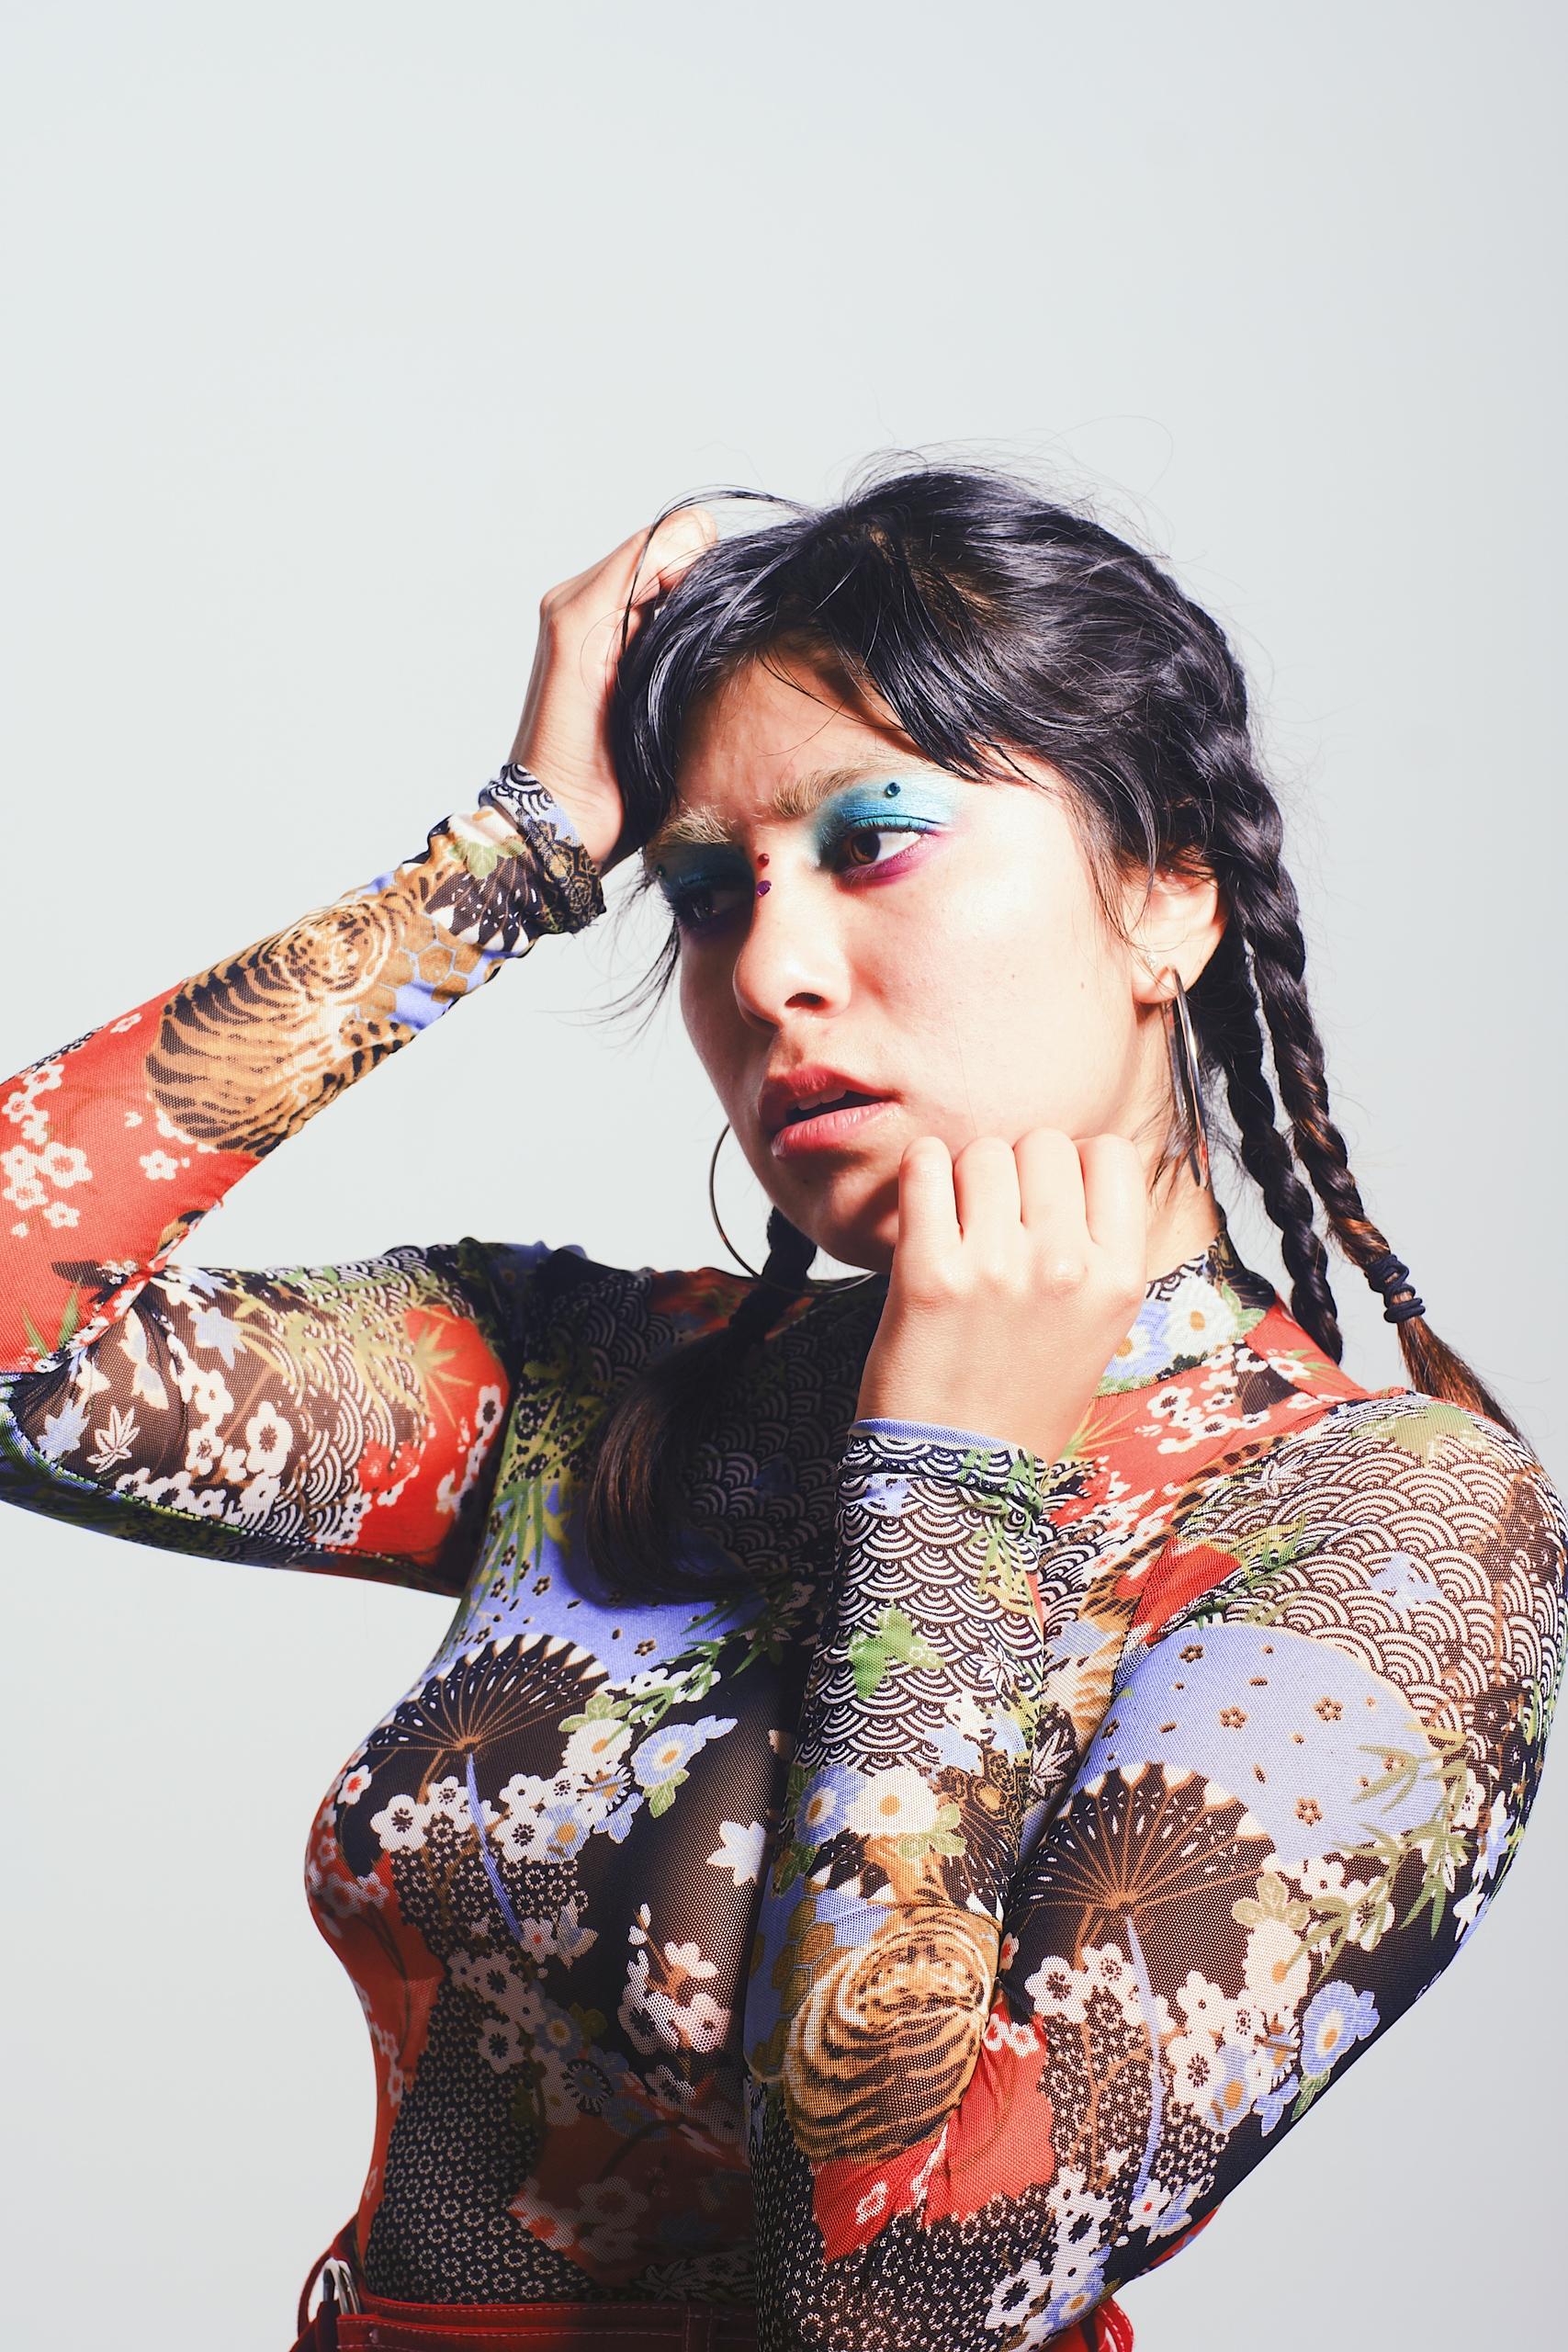 Maryza, 2018 - massivebear   ello